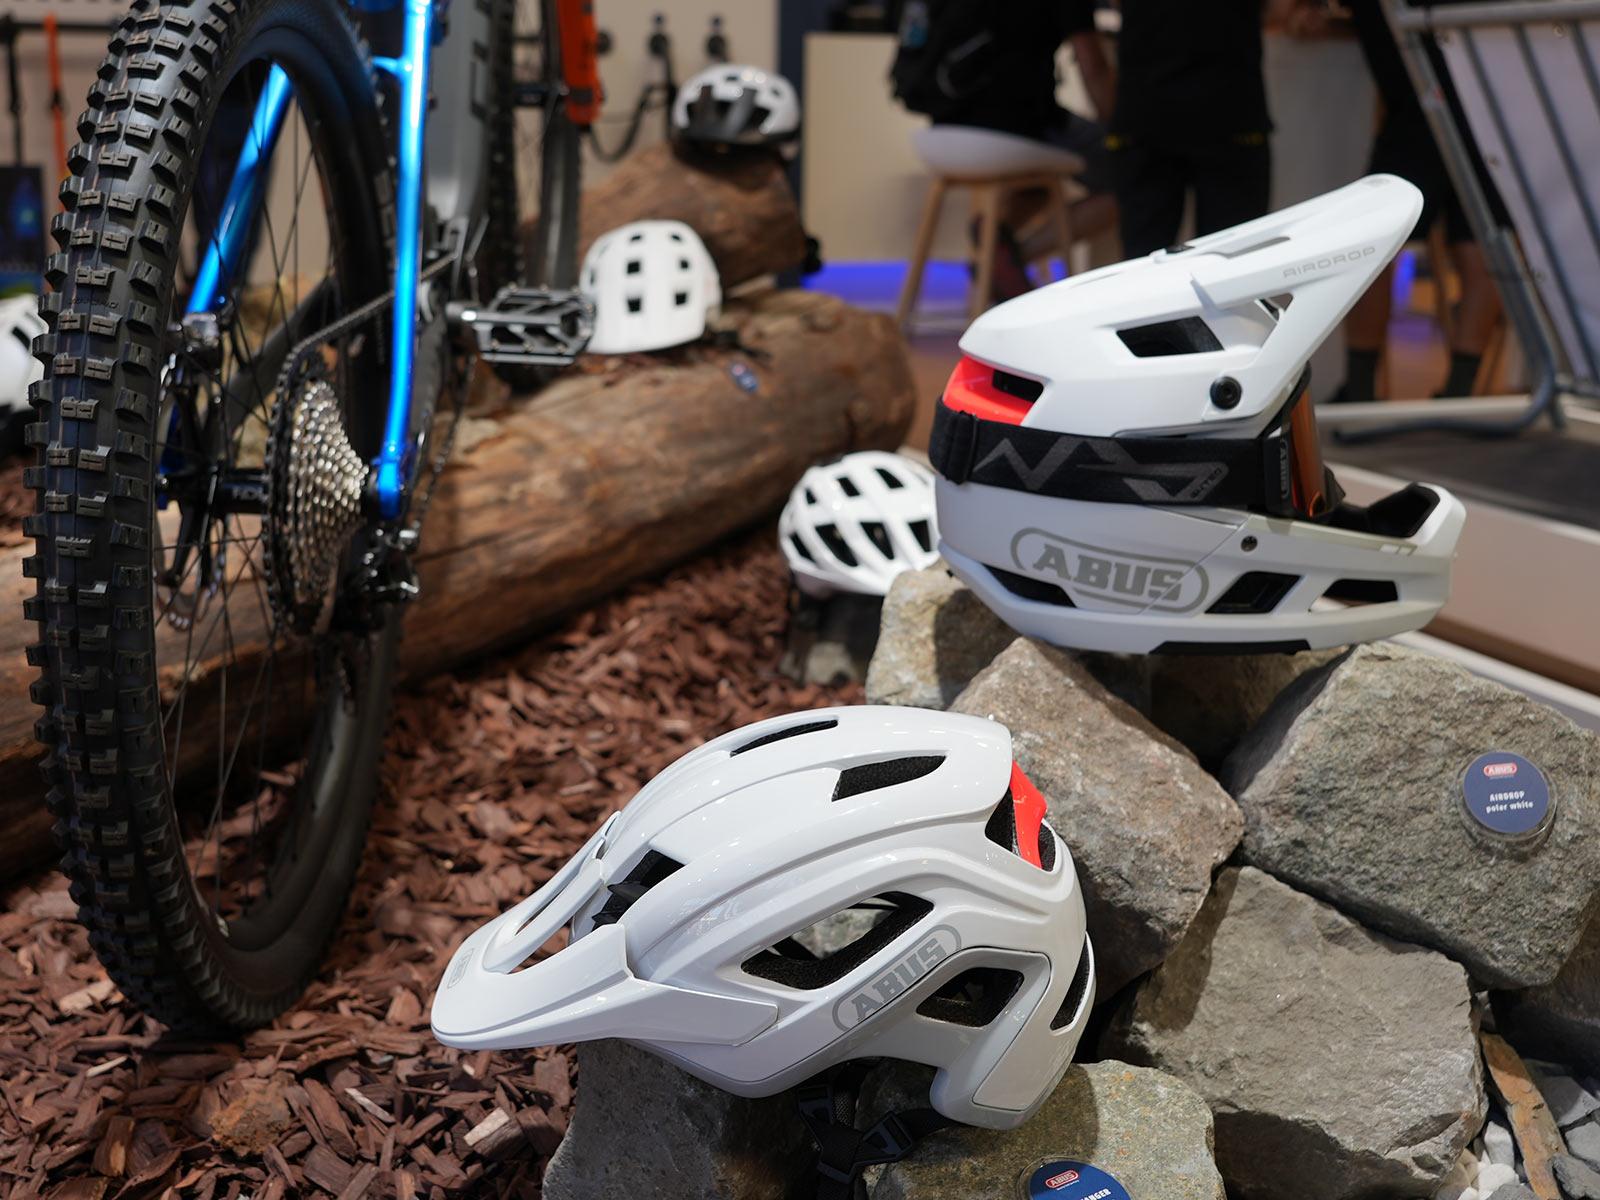 abus 2022 mountain bike helmet collection